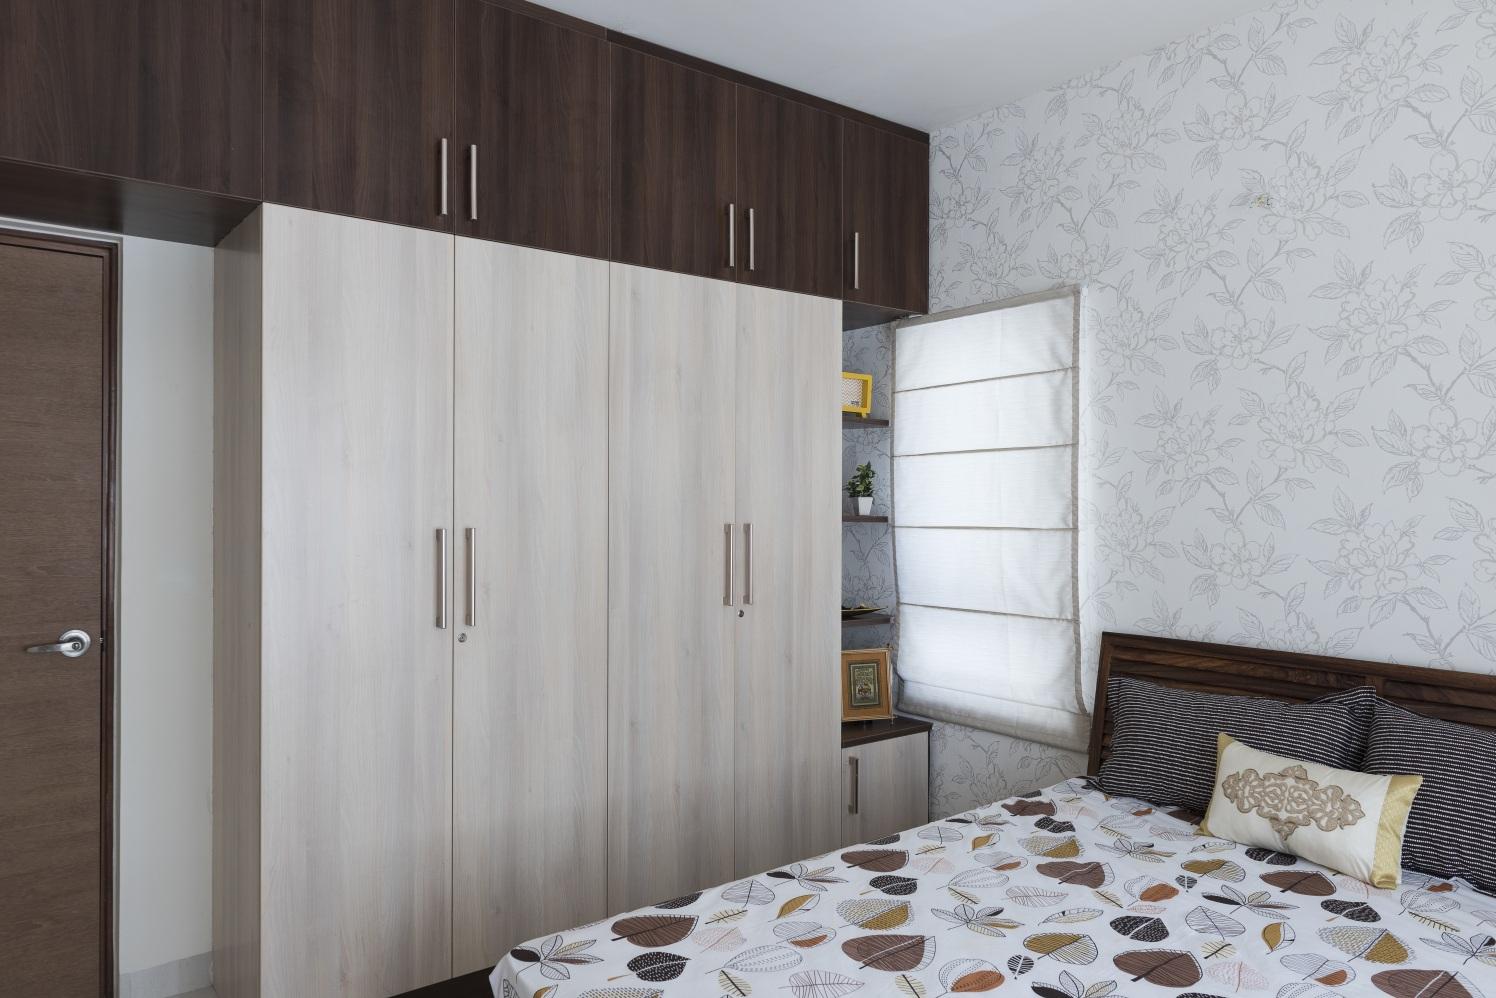 The Veneer Shine by HomeLane Bedroom Contemporary | Interior Design Photos & Ideas